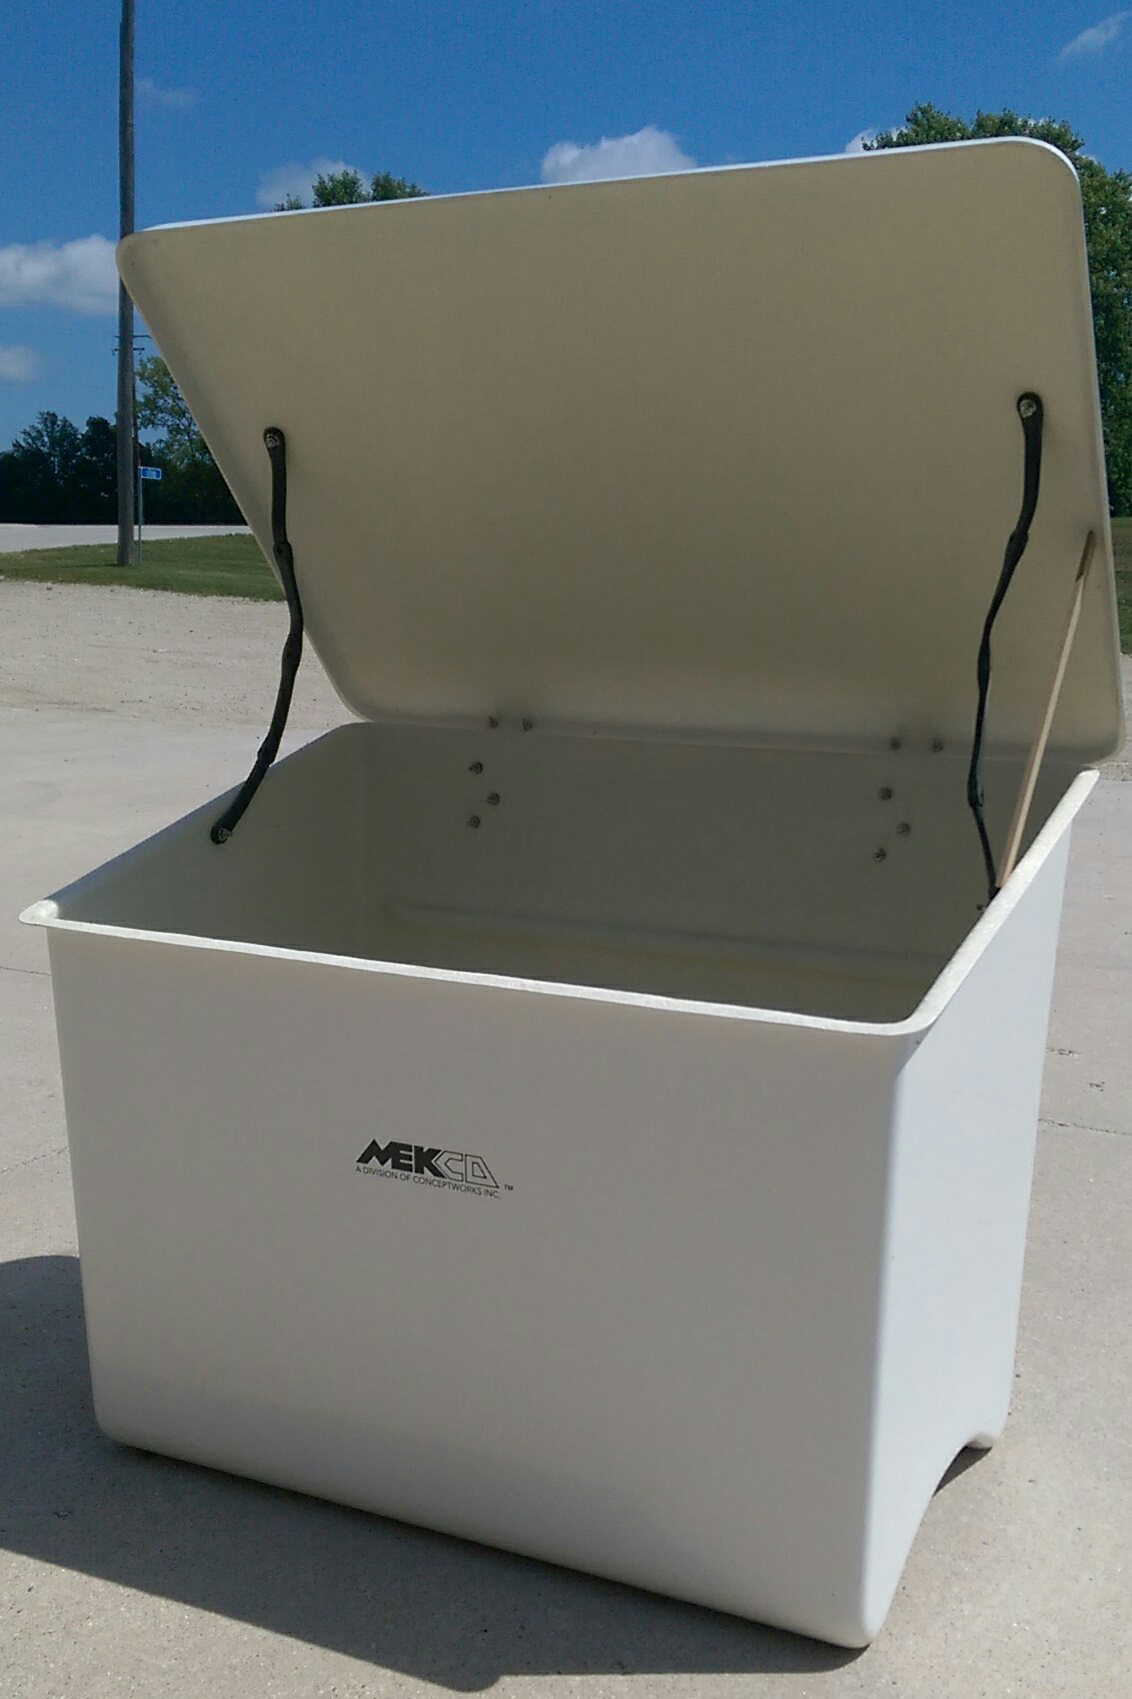 Mekco-Custom-Product-6.jpg